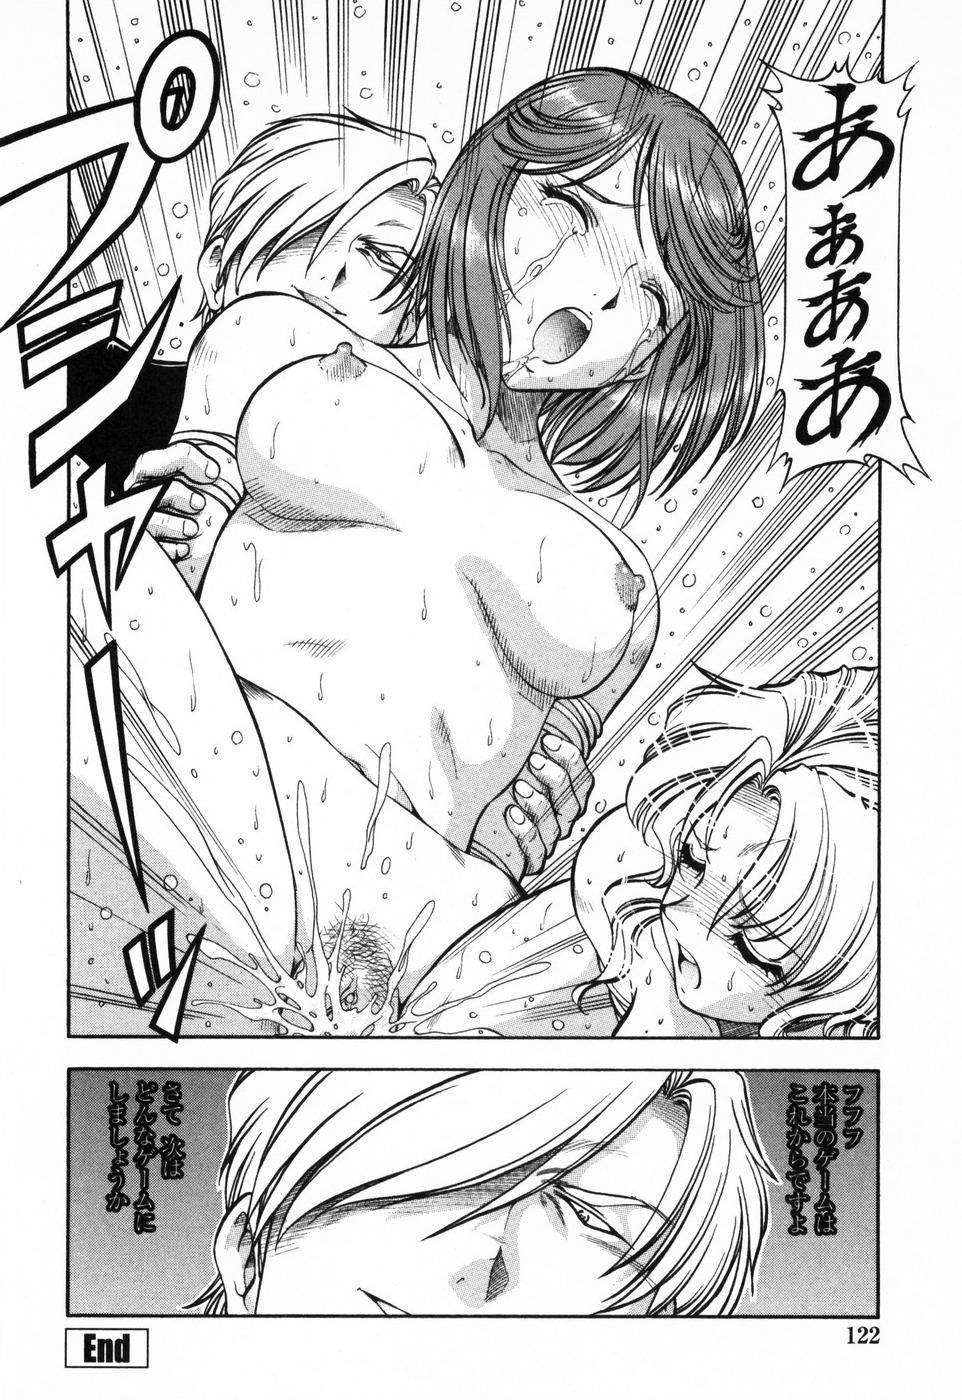 Kichiku Houteishiki - Equation of brutal person 128